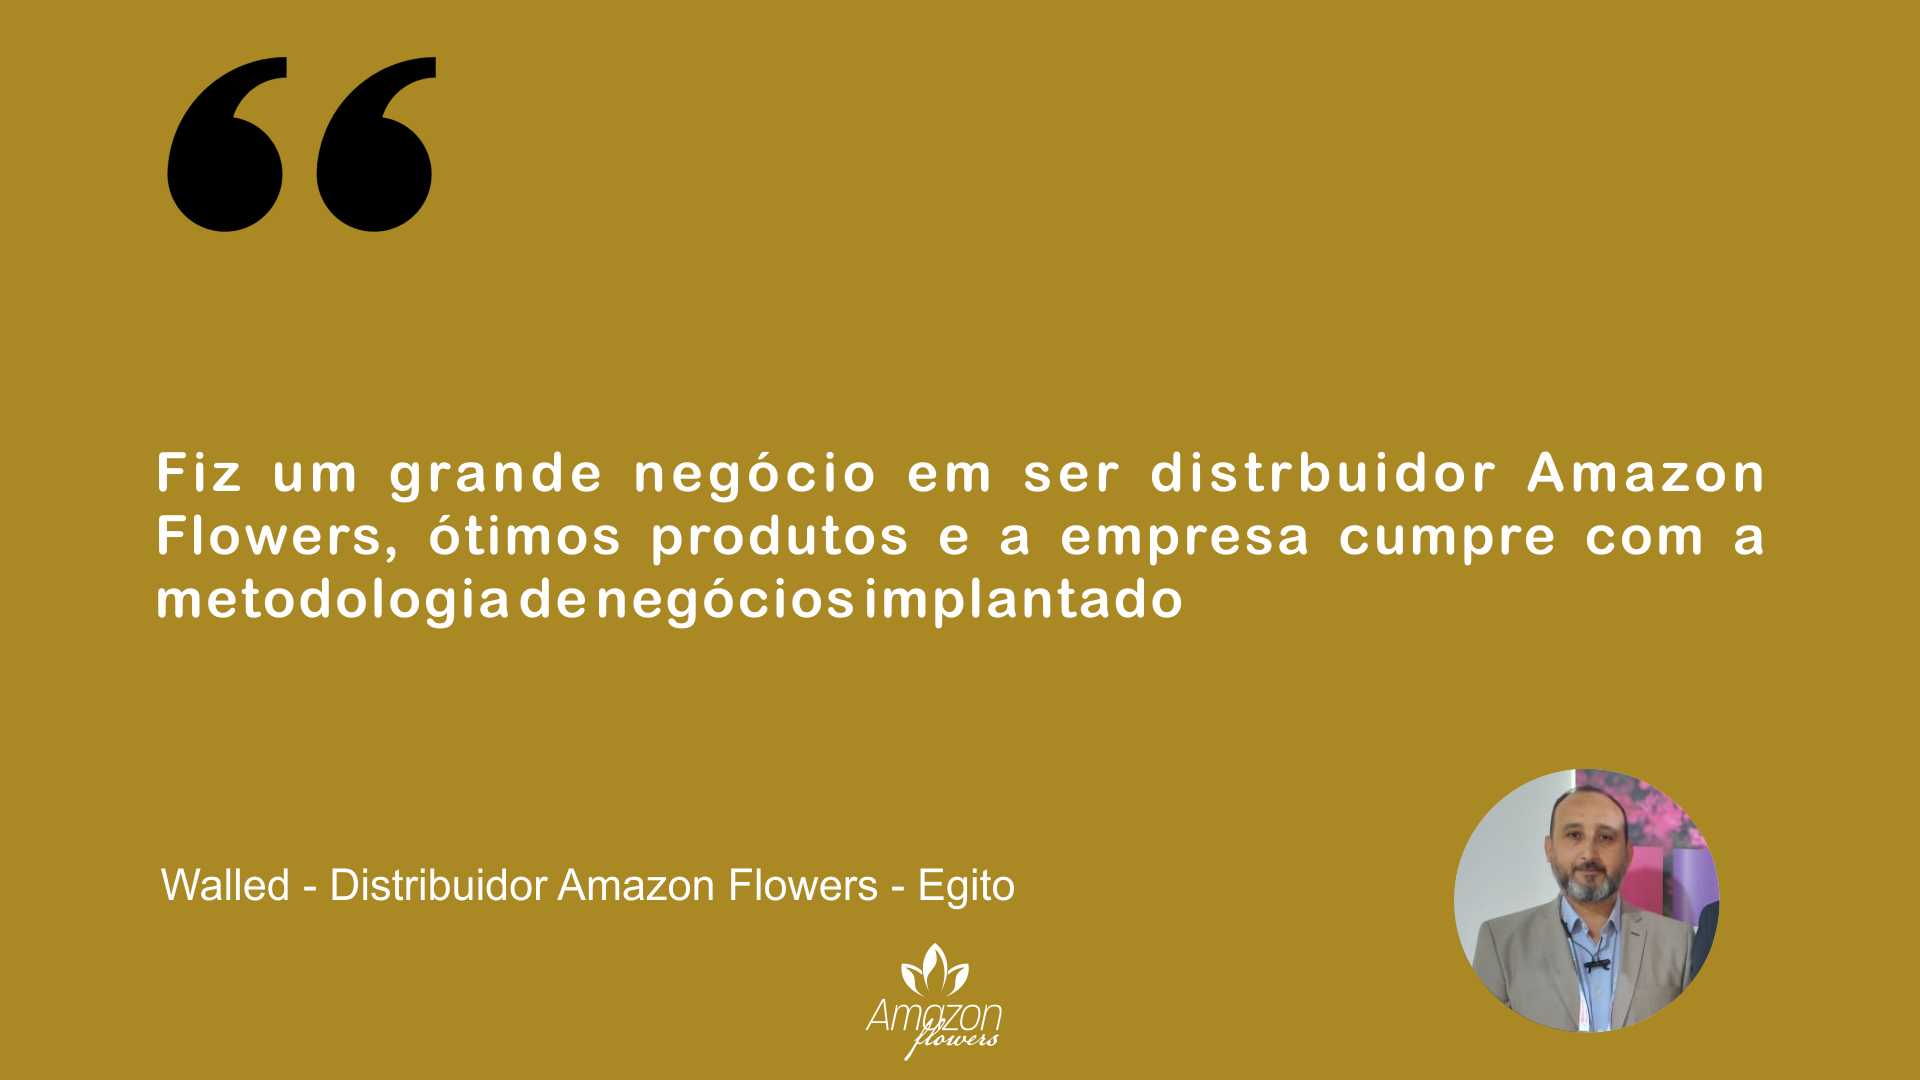 Walled - Distribuidor Amazon Flowers - Egito